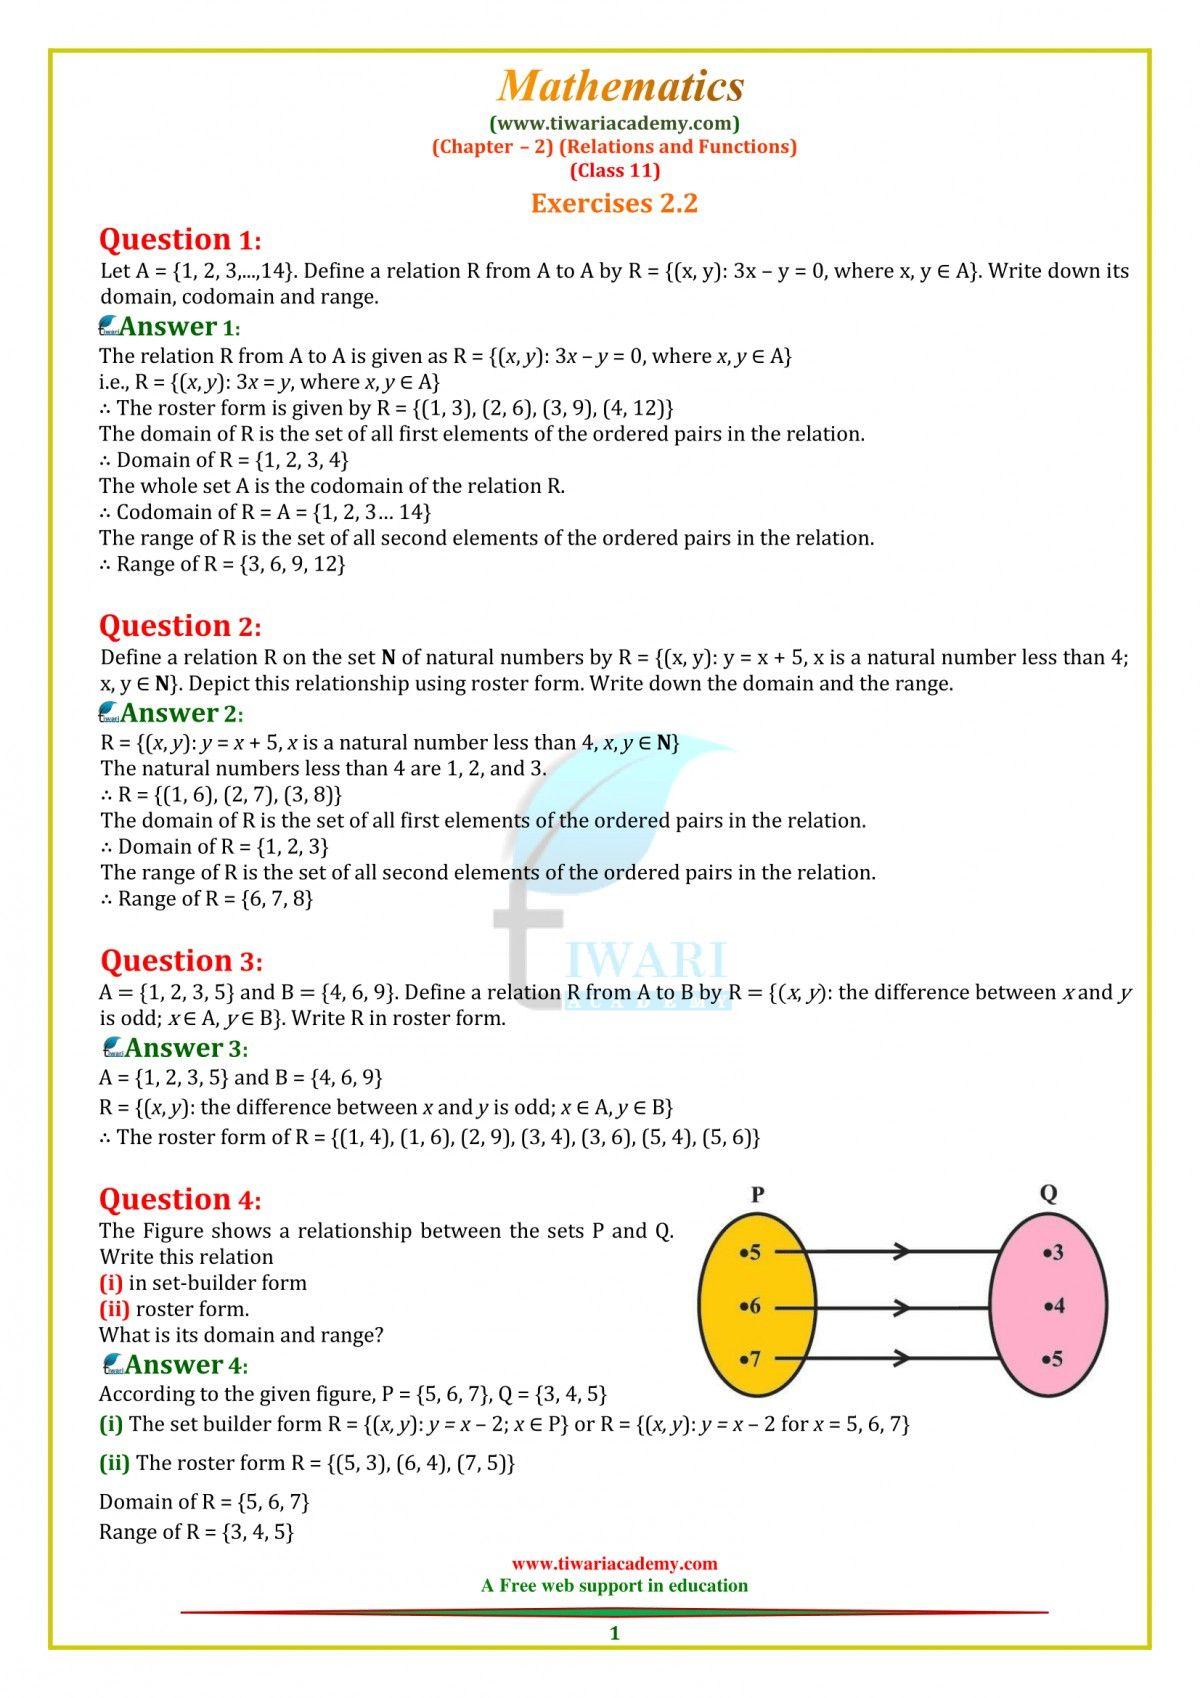 Https Www Tiwariacademy Com Ncert Solutions Ncert Solutions 11 Maths Chapter 2 Functions Math Math Solutions [ 1698 x 1200 Pixel ]